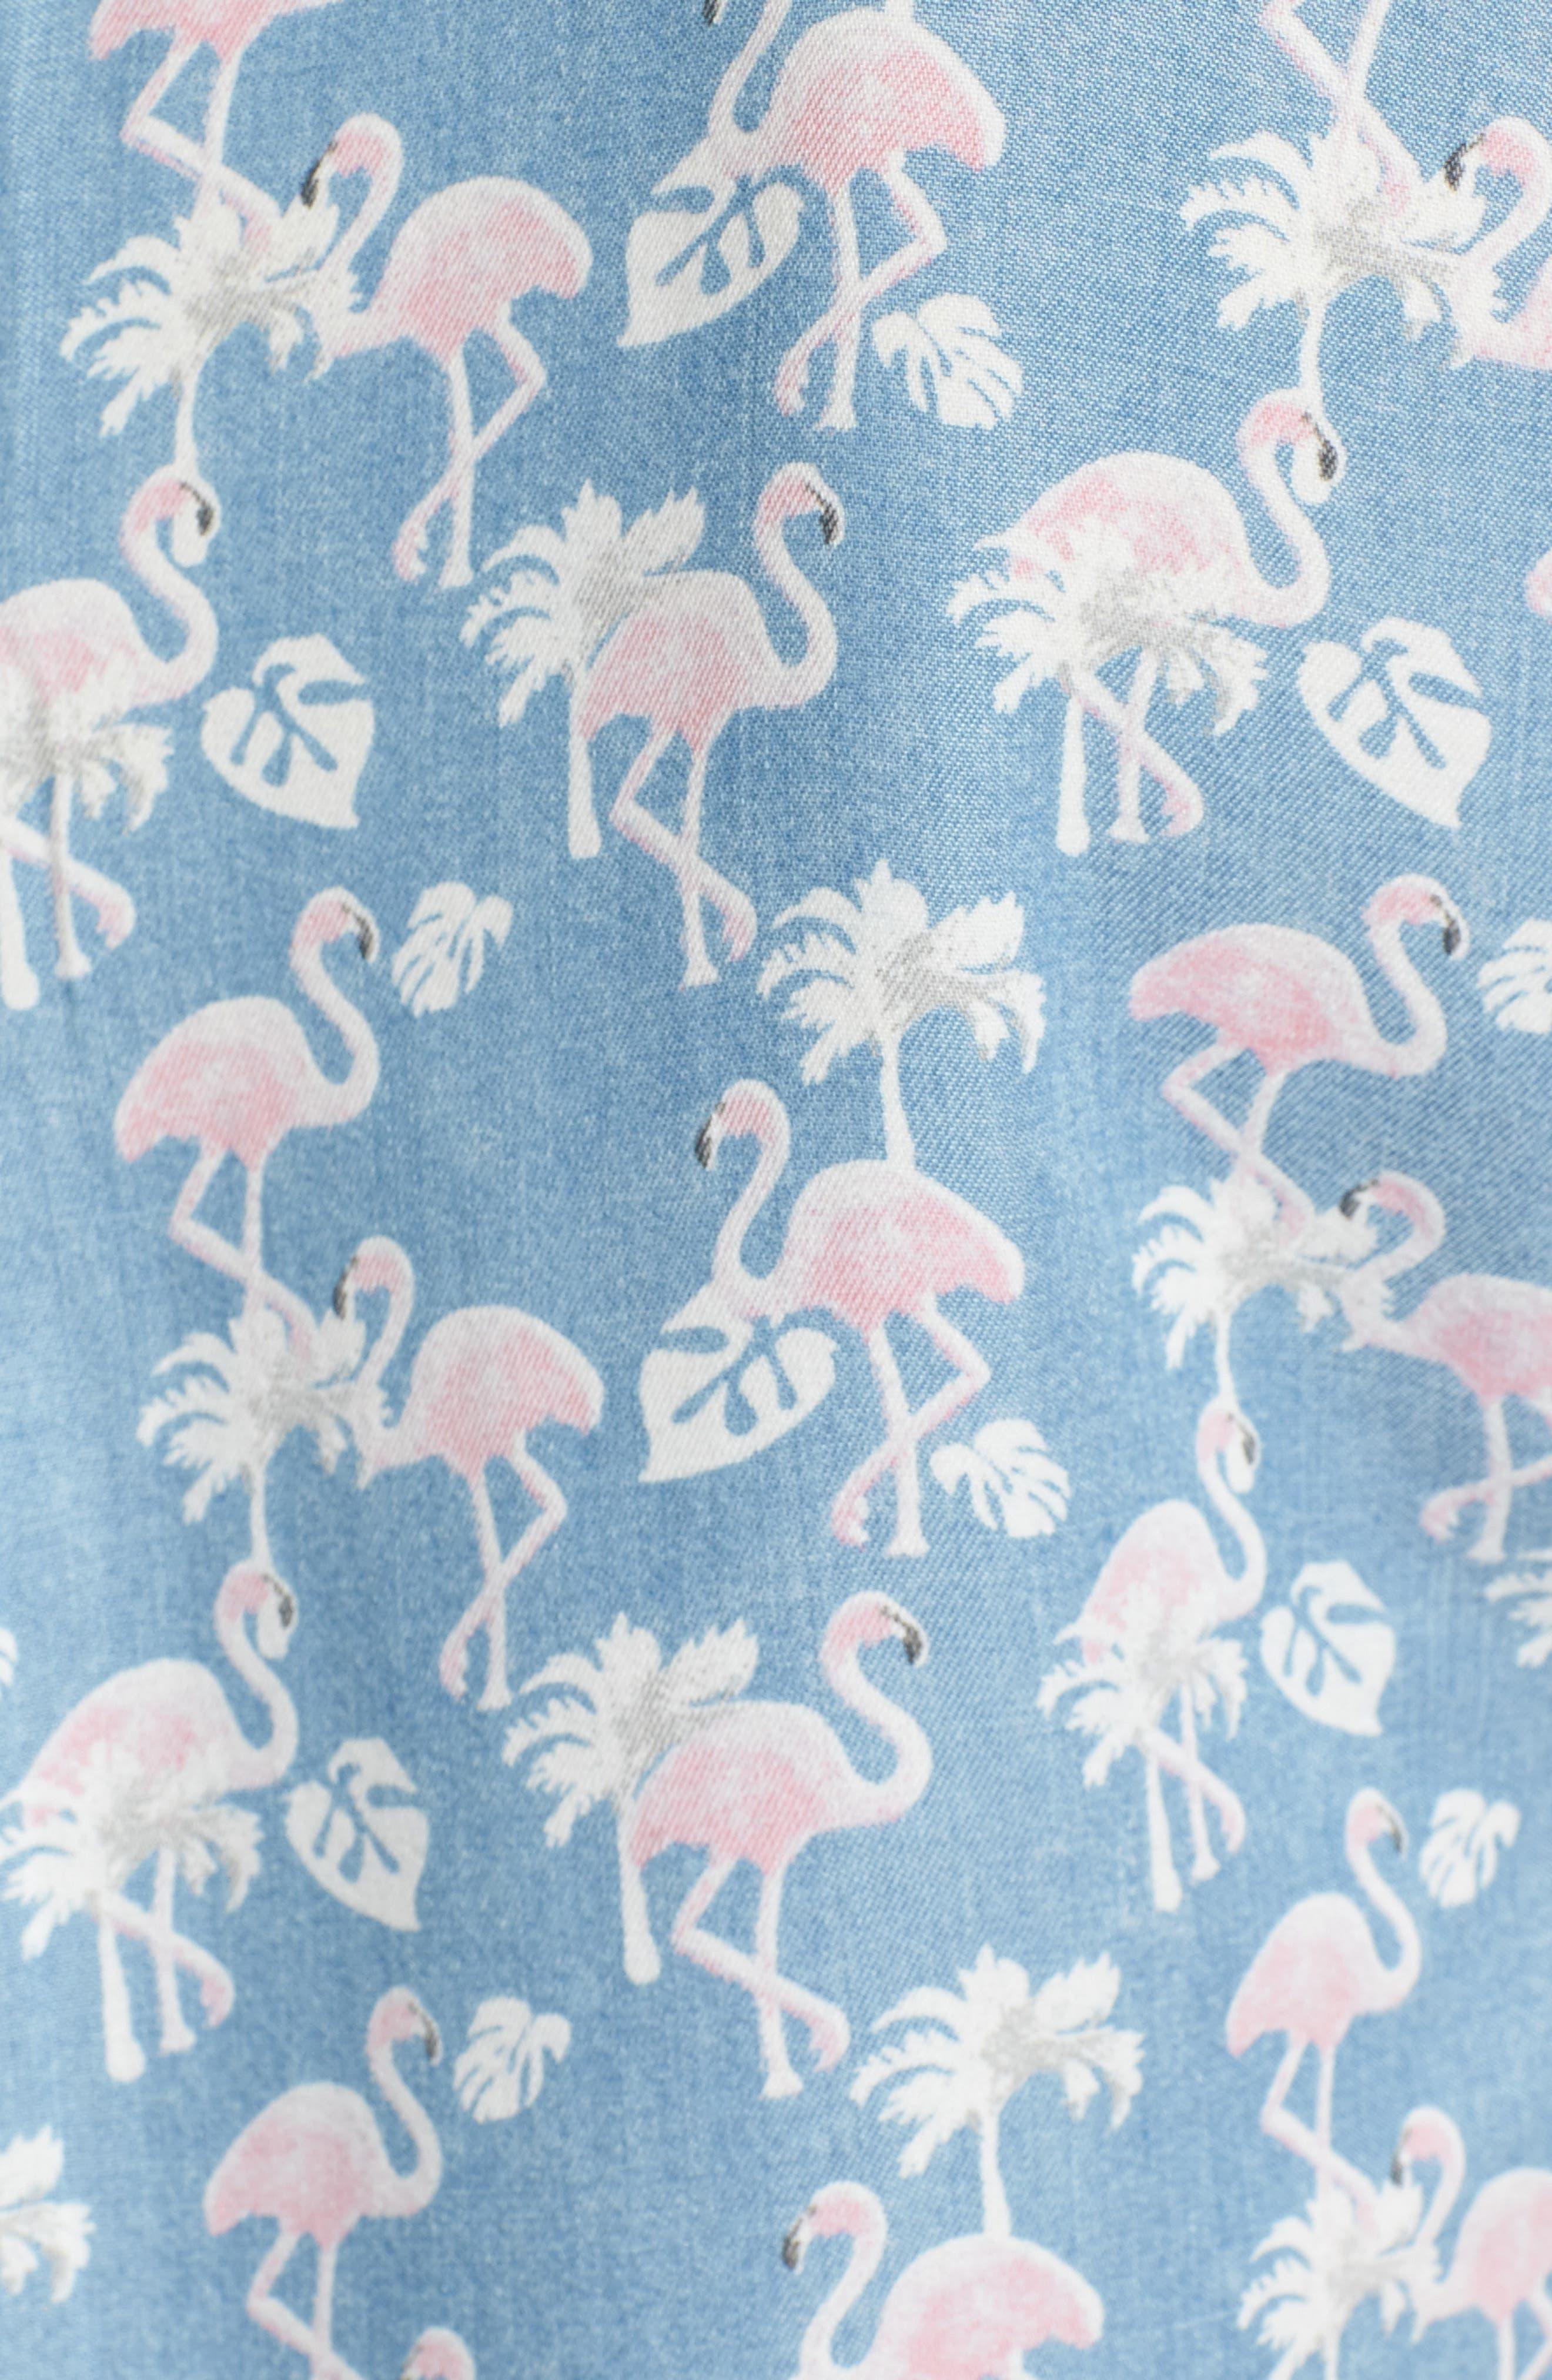 Flamingo Lace-Up Back Popover Top,                             Alternate thumbnail 5, color,                             Blue Flamingo